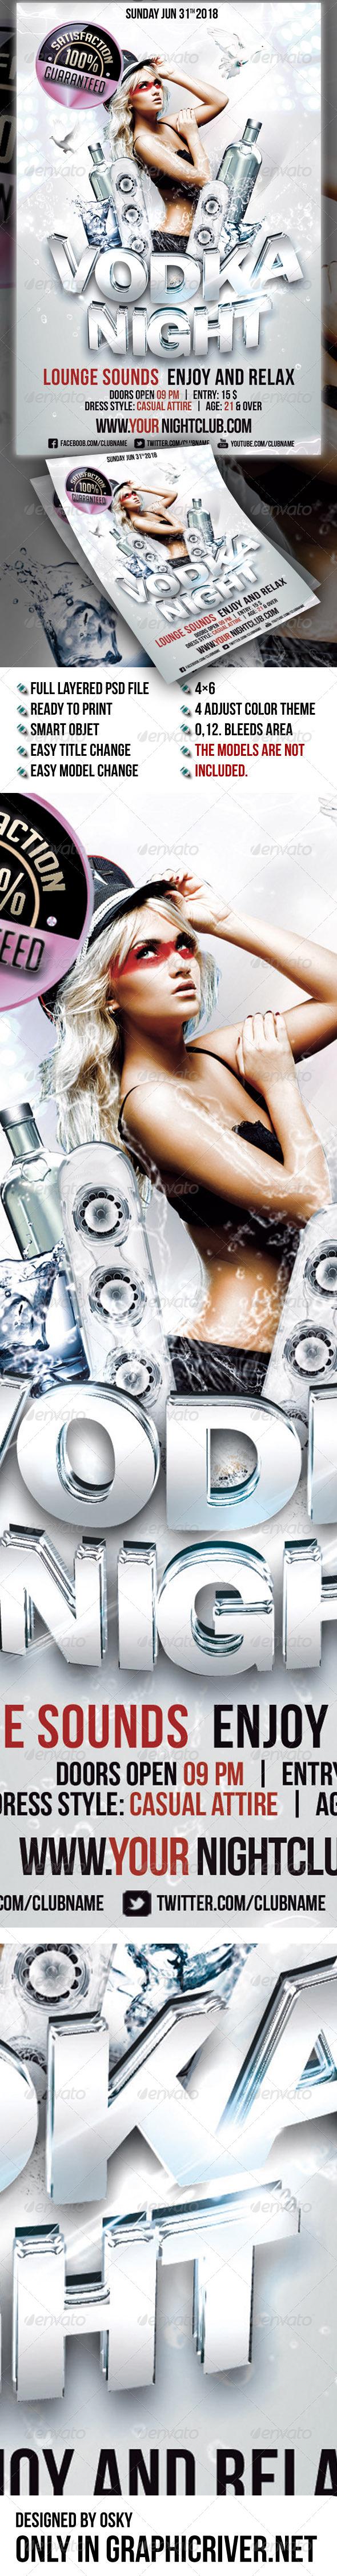 GraphicRiver Vodka Night III 6612030